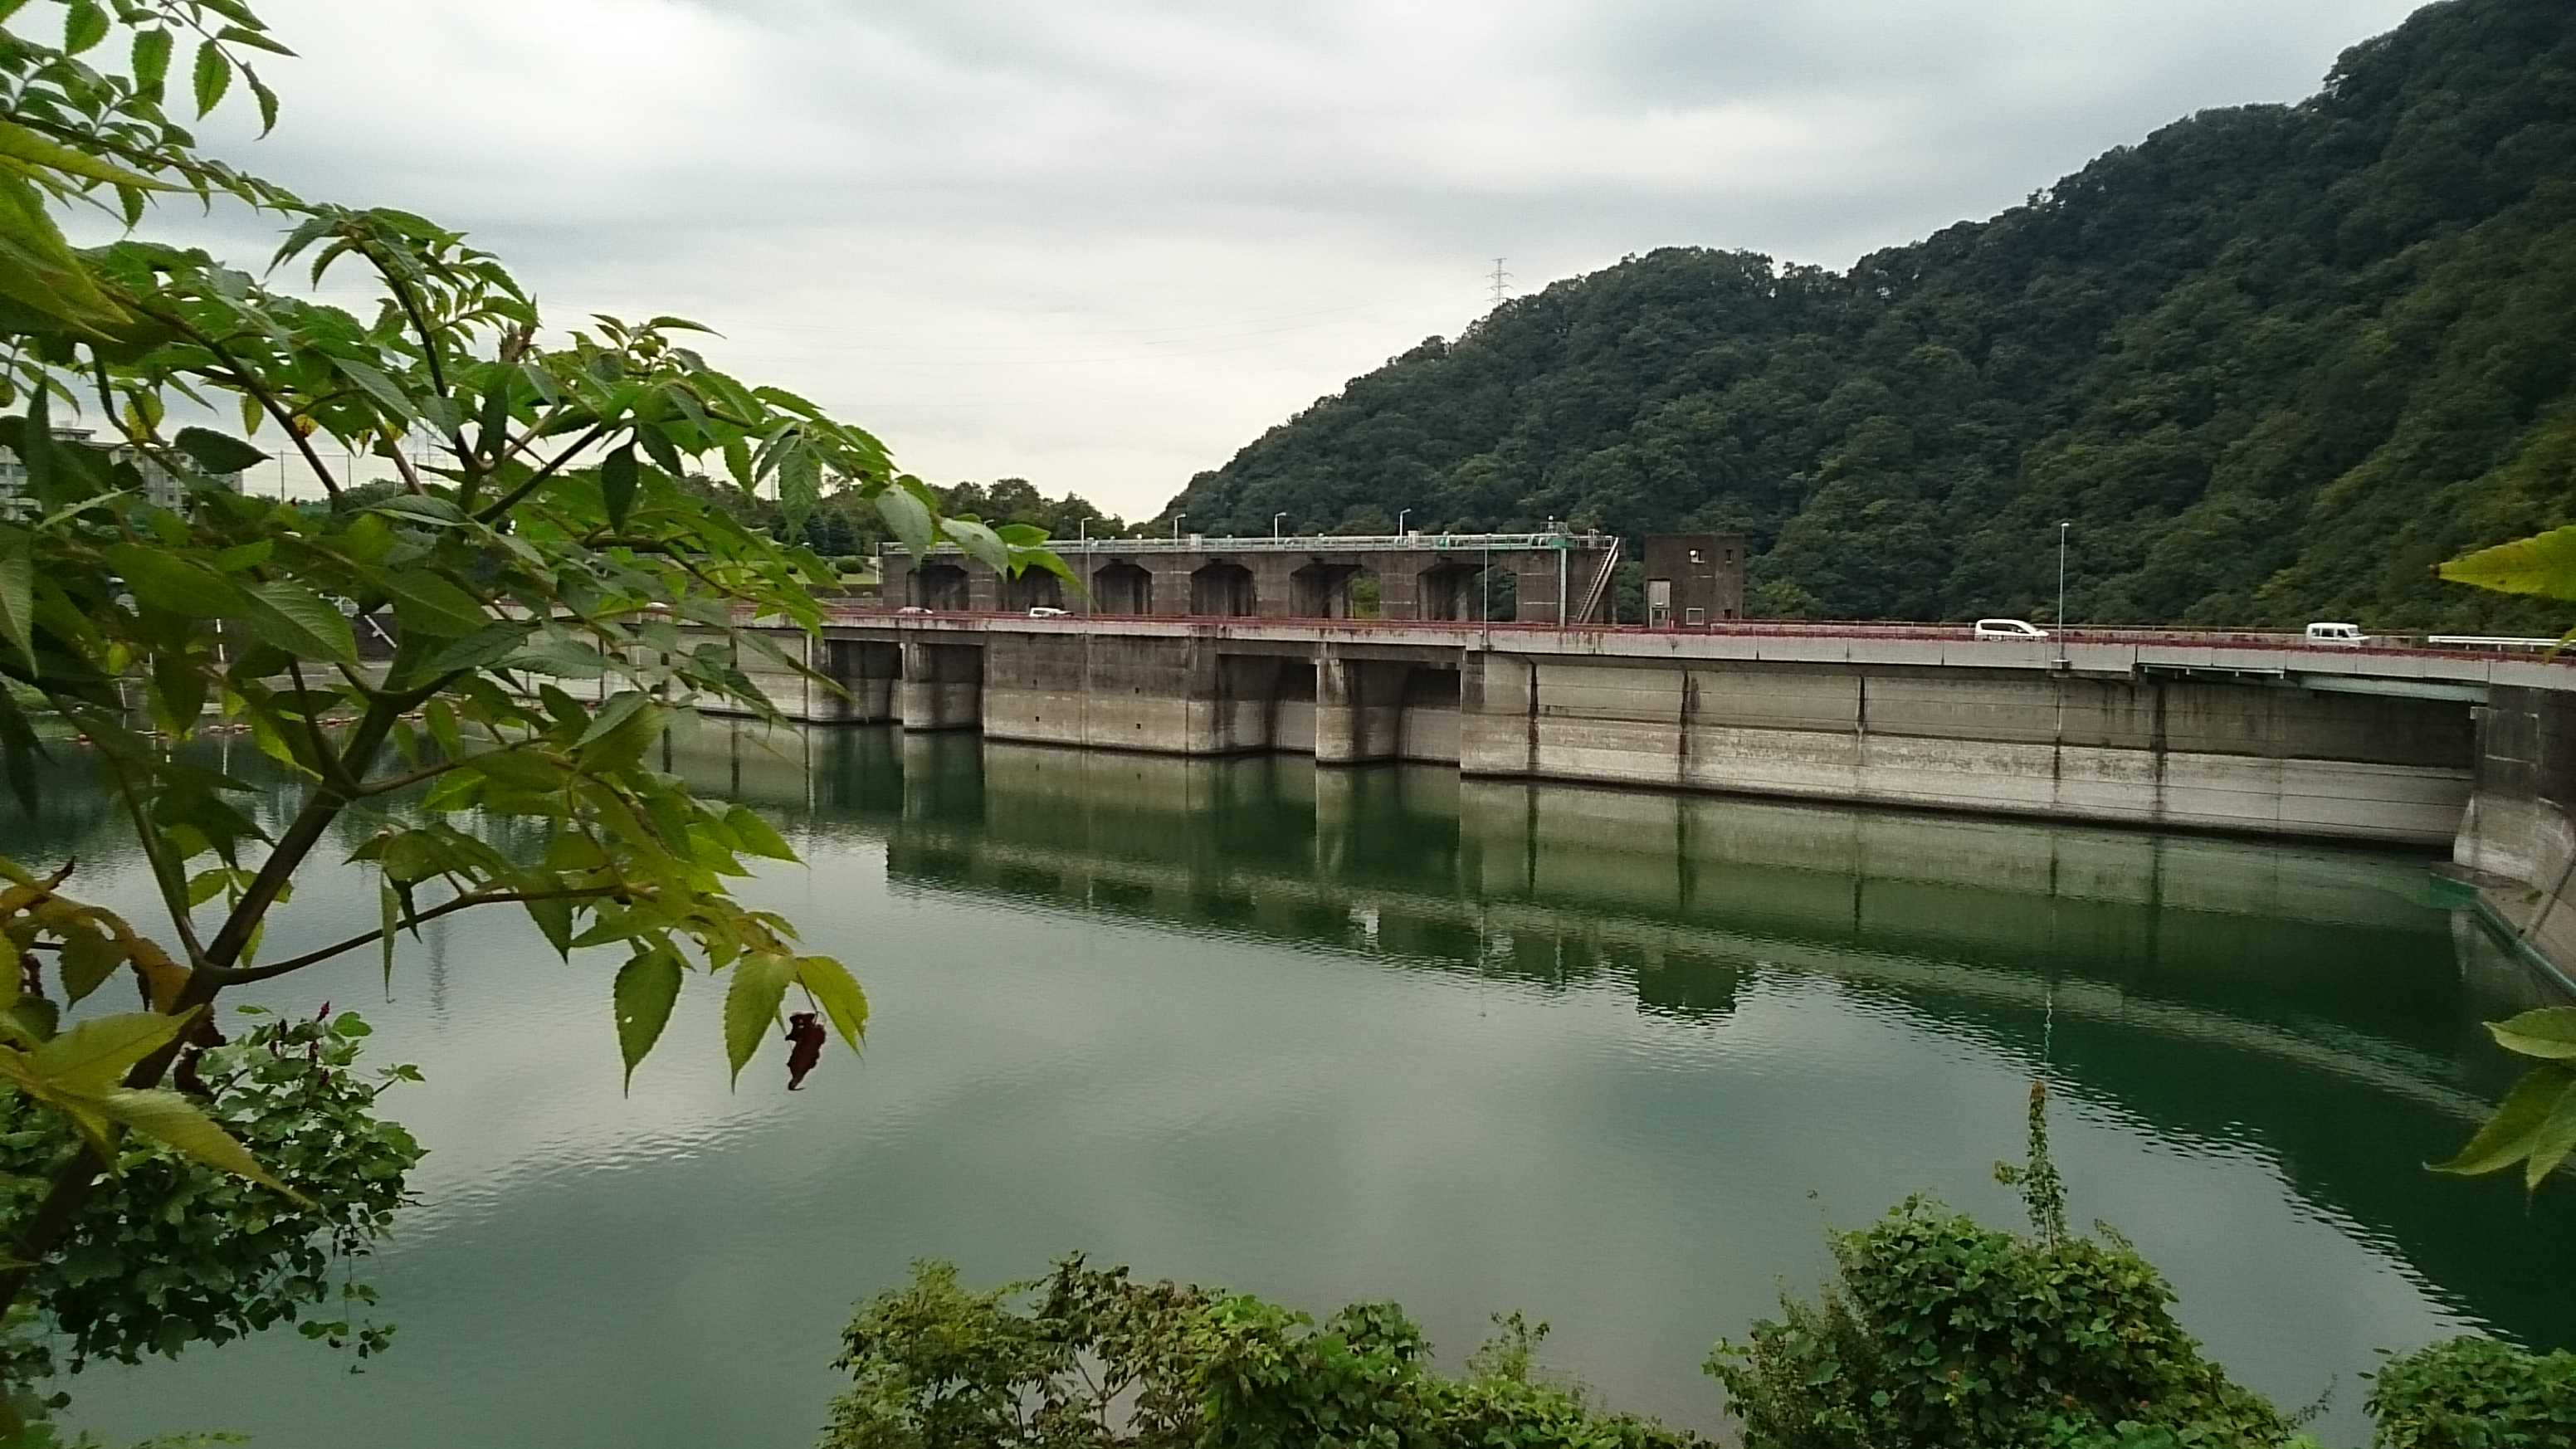 20140920②津久井湖城山ダム